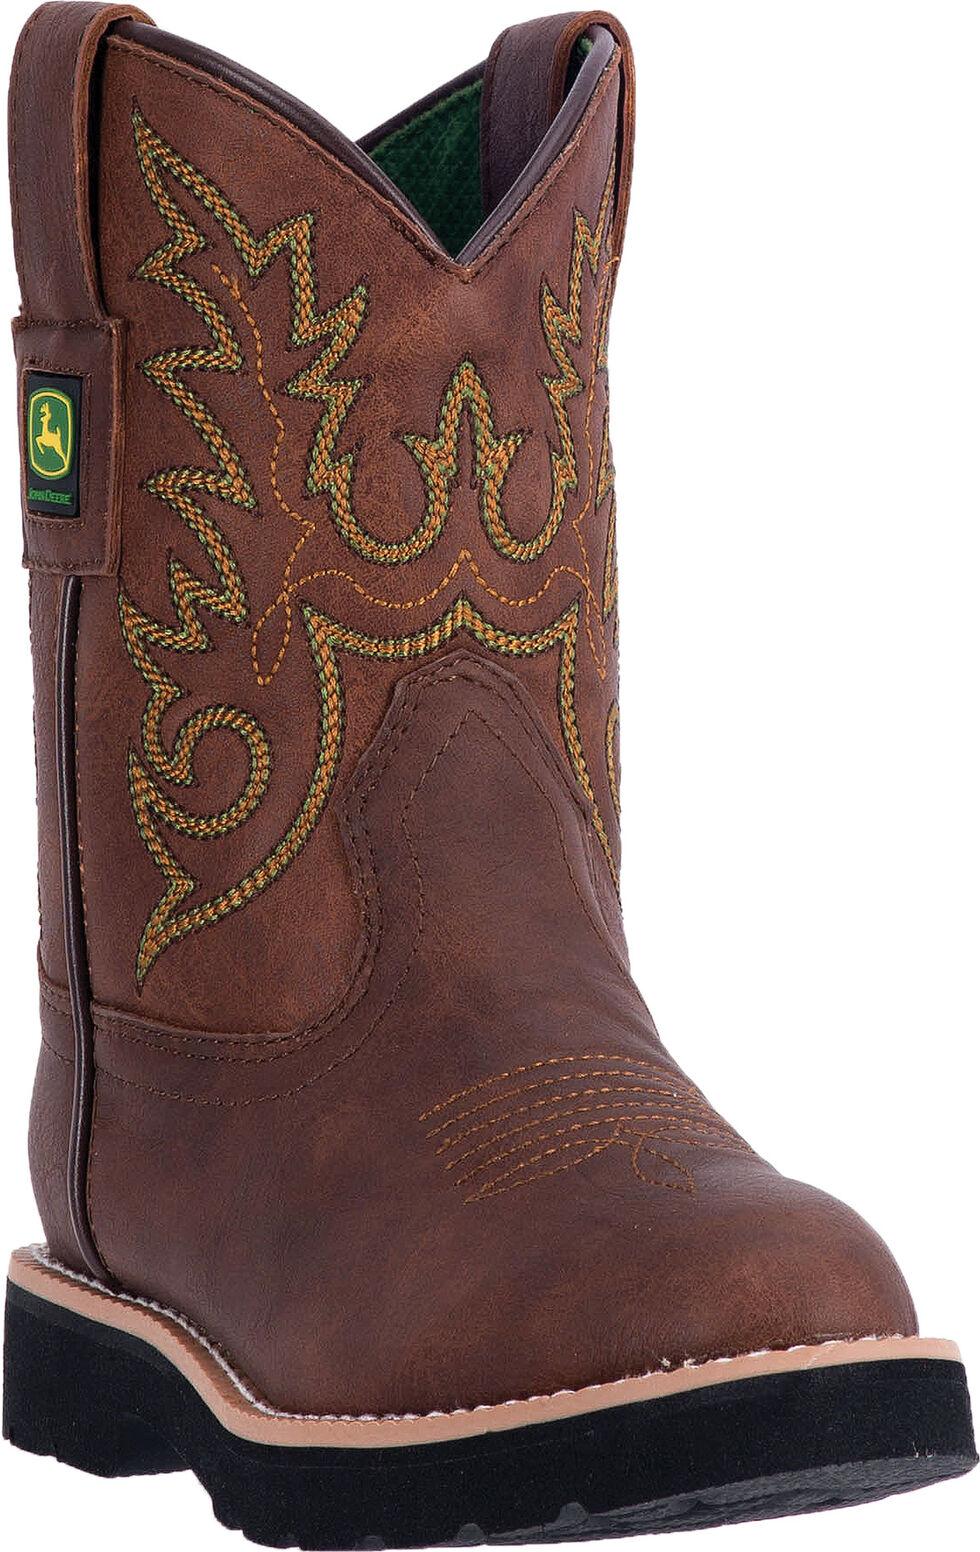 John Deere Kid's Chestnut Western Boots - Round Toe, Brown, hi-res